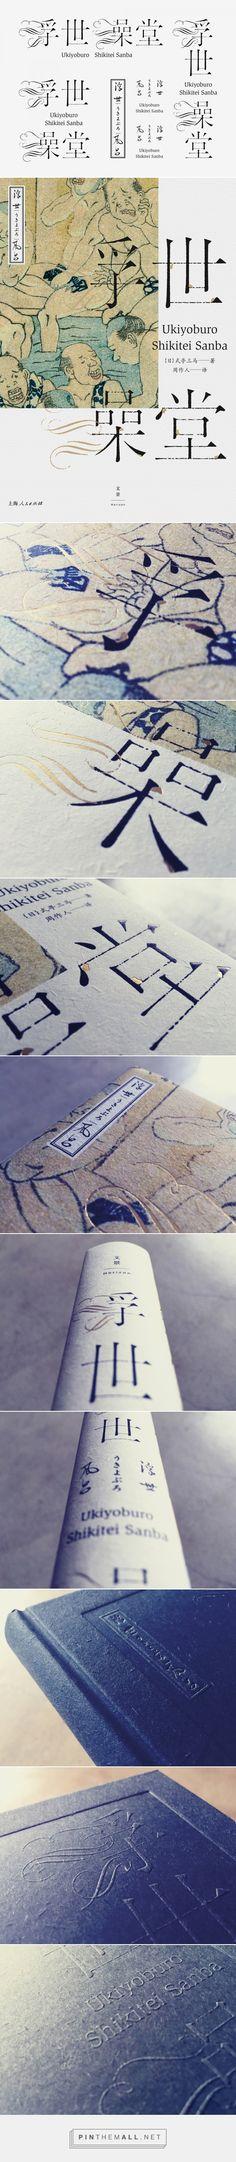 Typo Logo Design, Typographic Design, Graphic Design Posters, Lettering Design, Graphic Prints, Branding Design, Book Cover Design, Book Design, Design Web